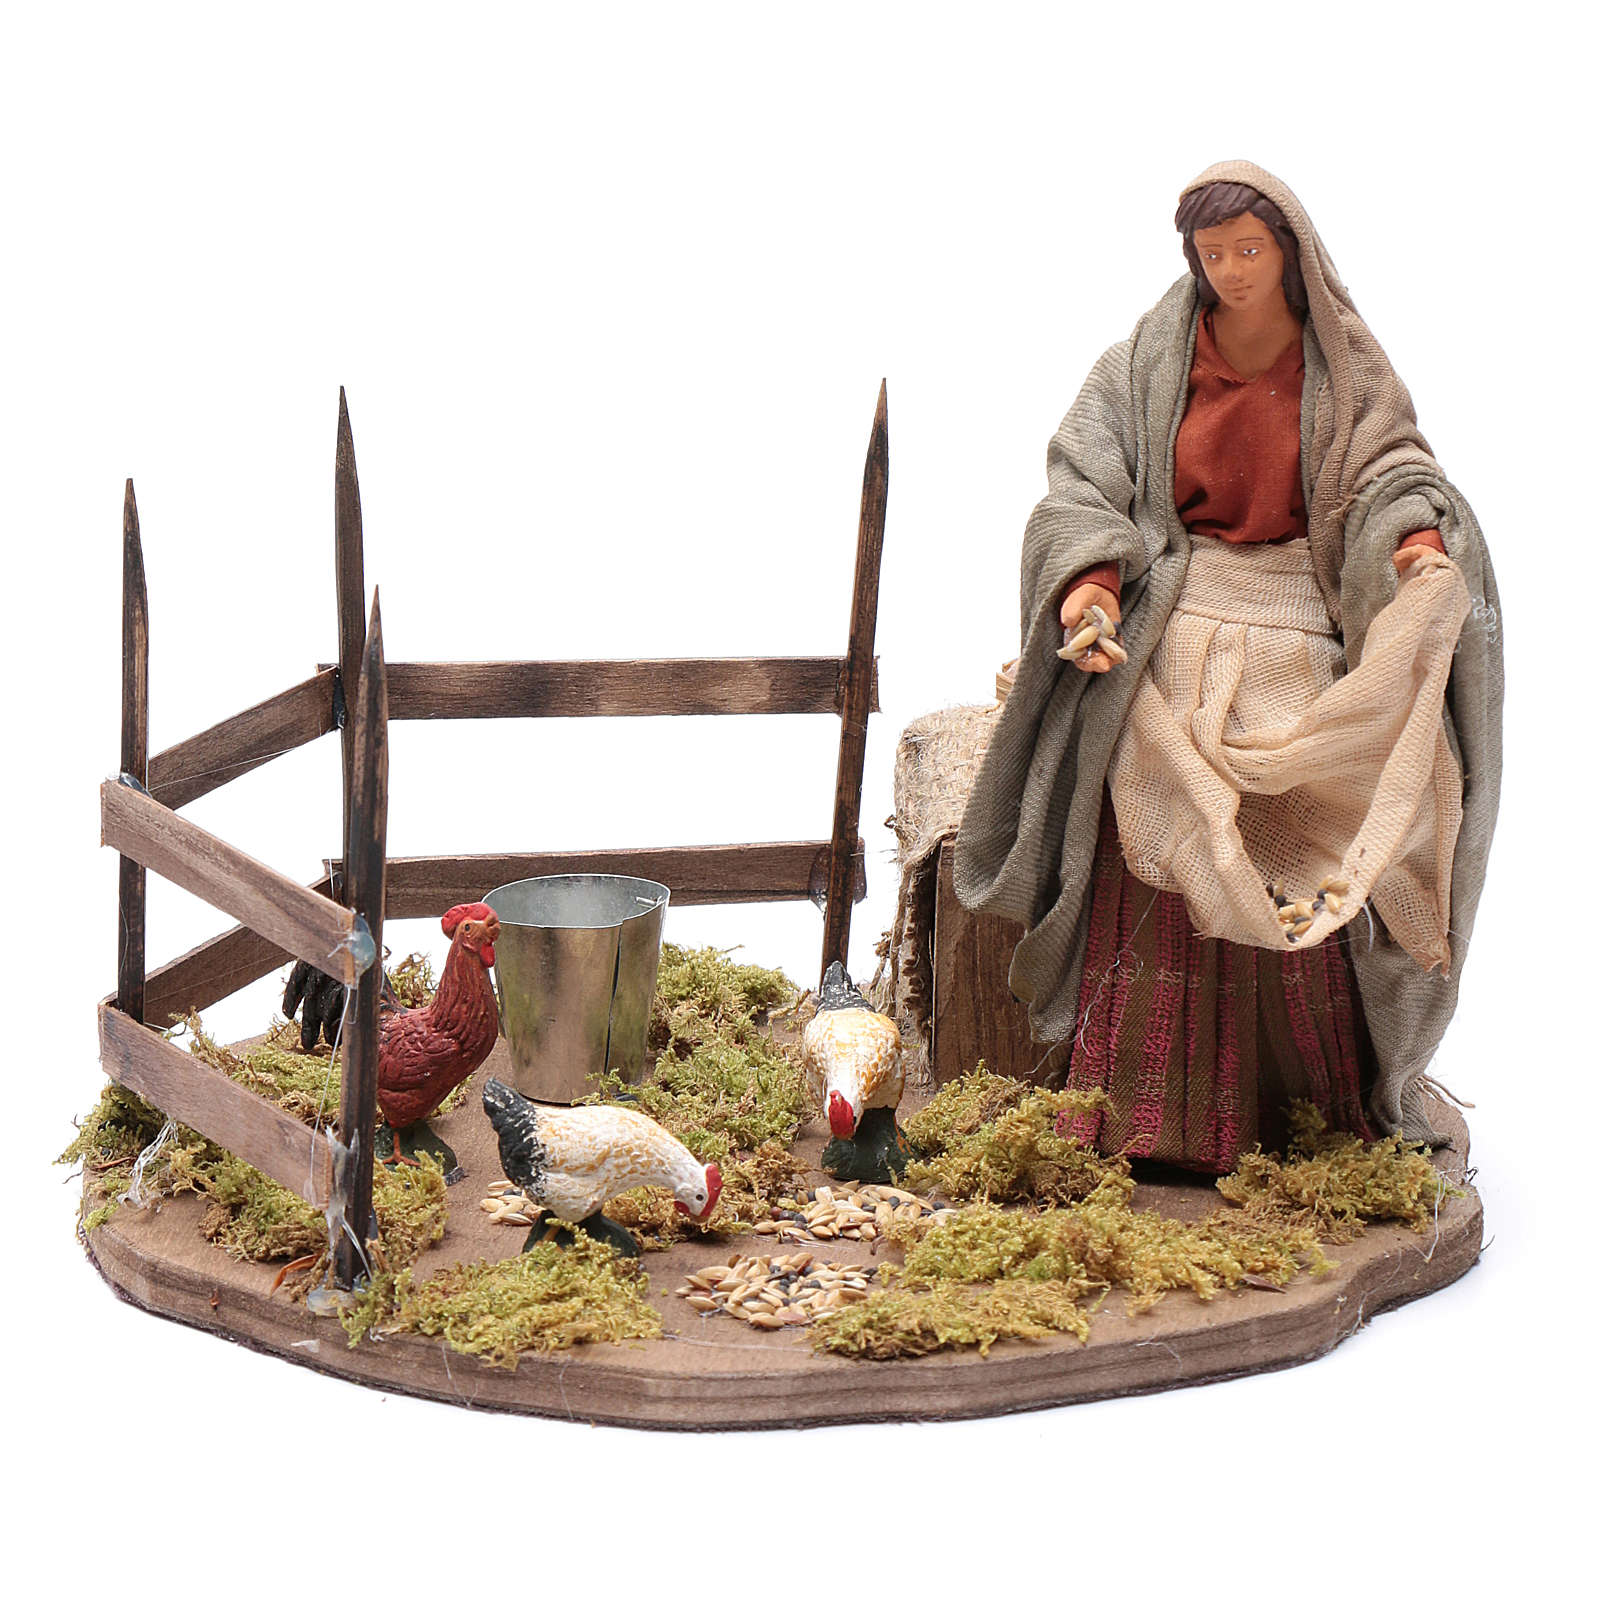 Lady feeding birds, animated Neapolitan Nativity figurine 14cm 4